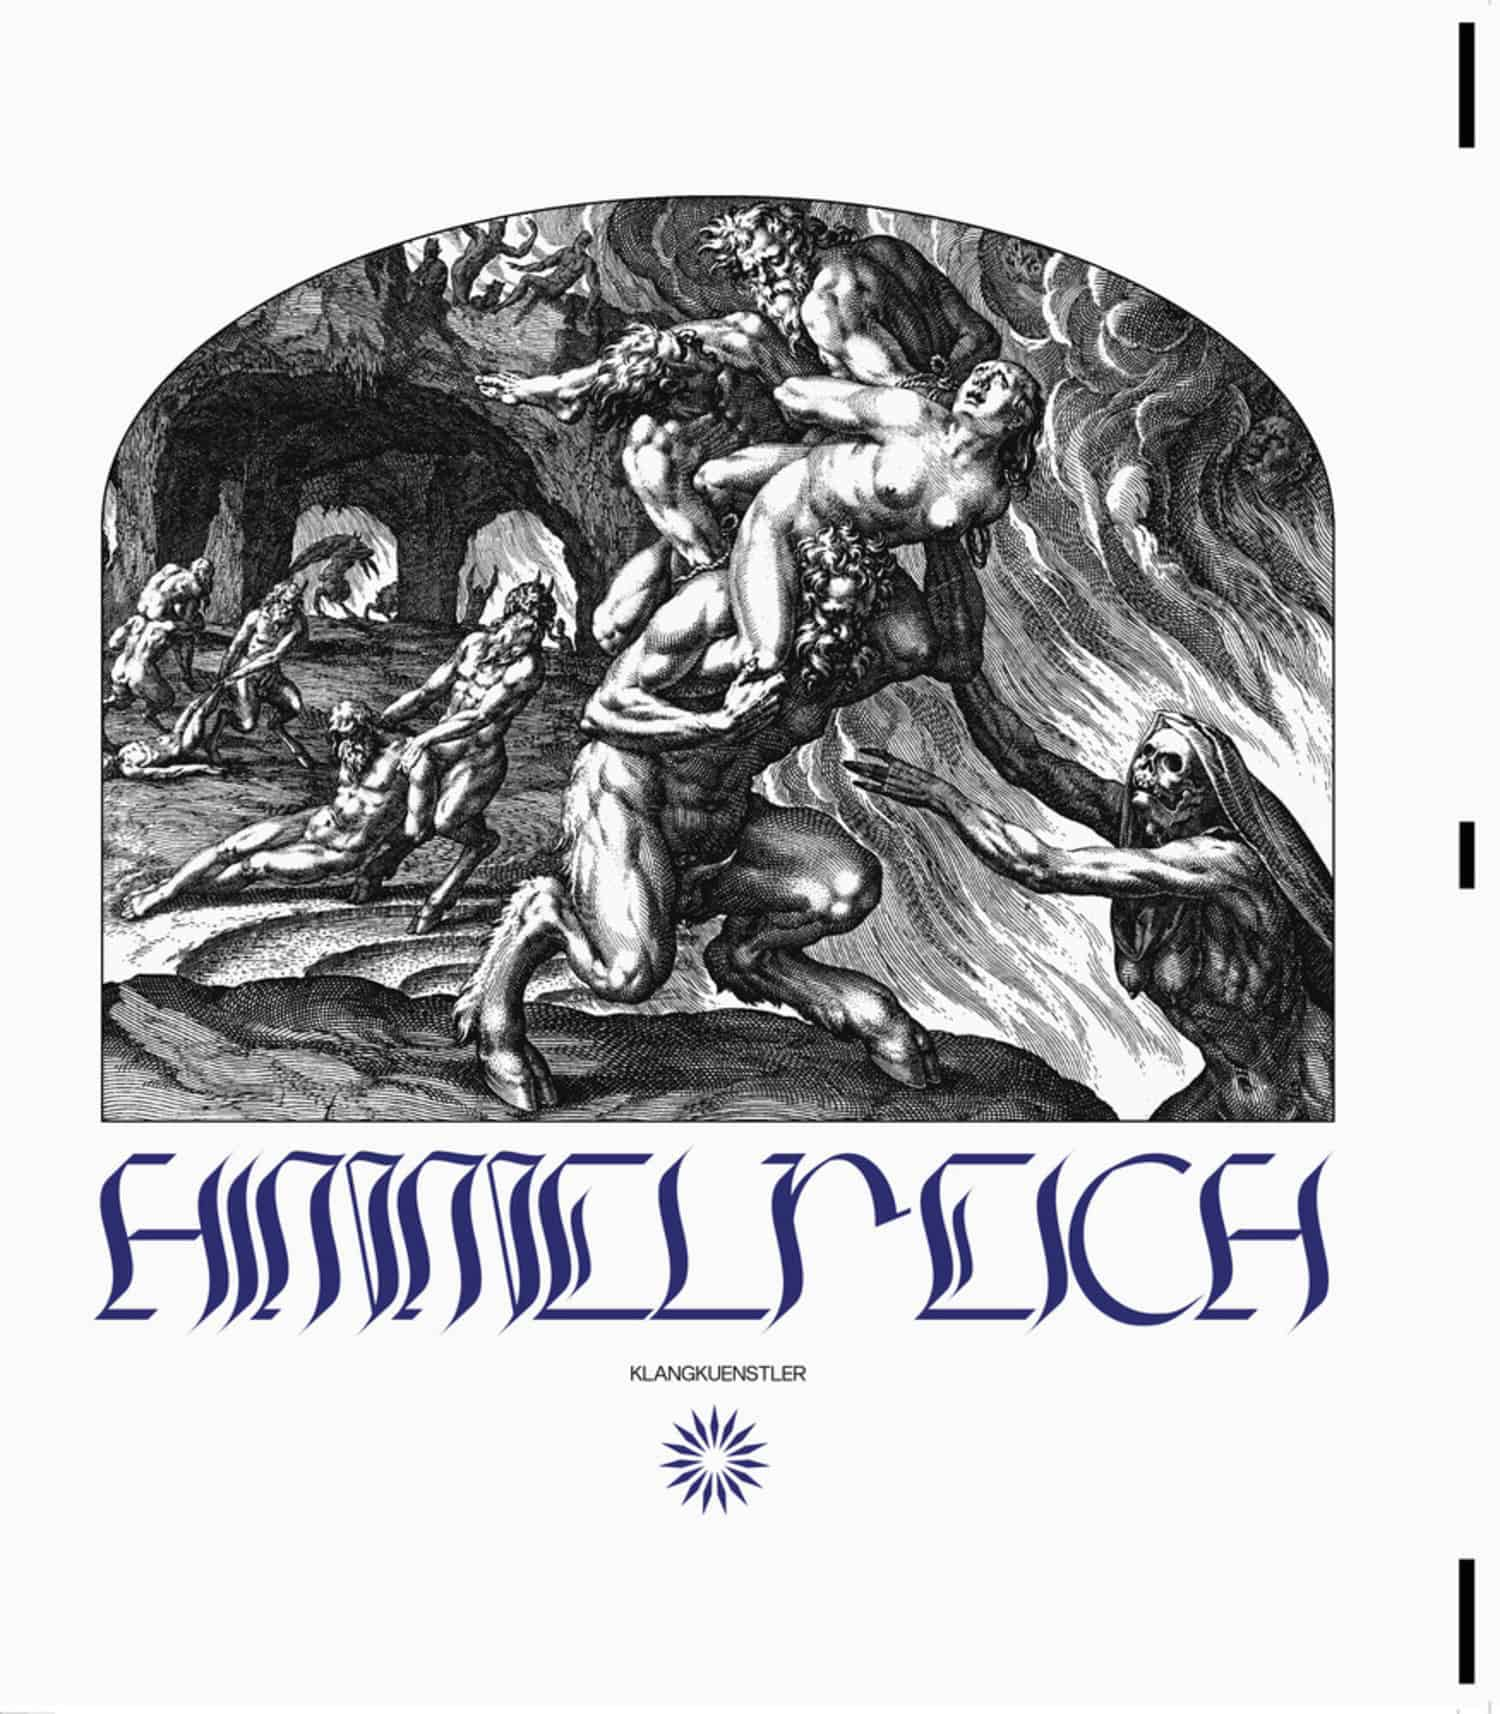 Klangkuenstler - HIMMELREICH